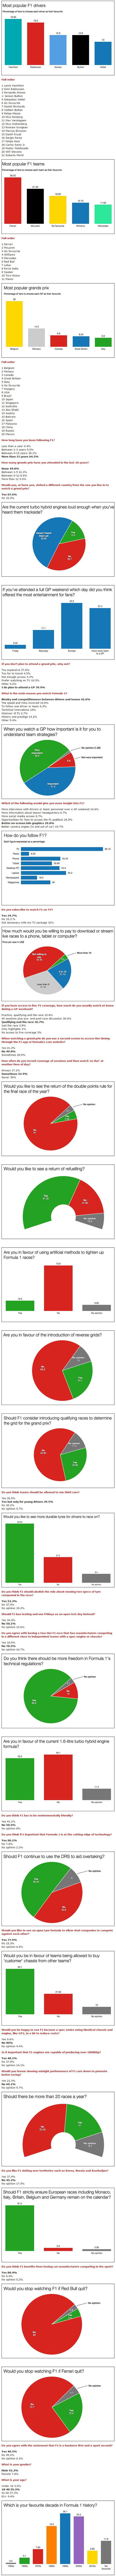 f1 survey